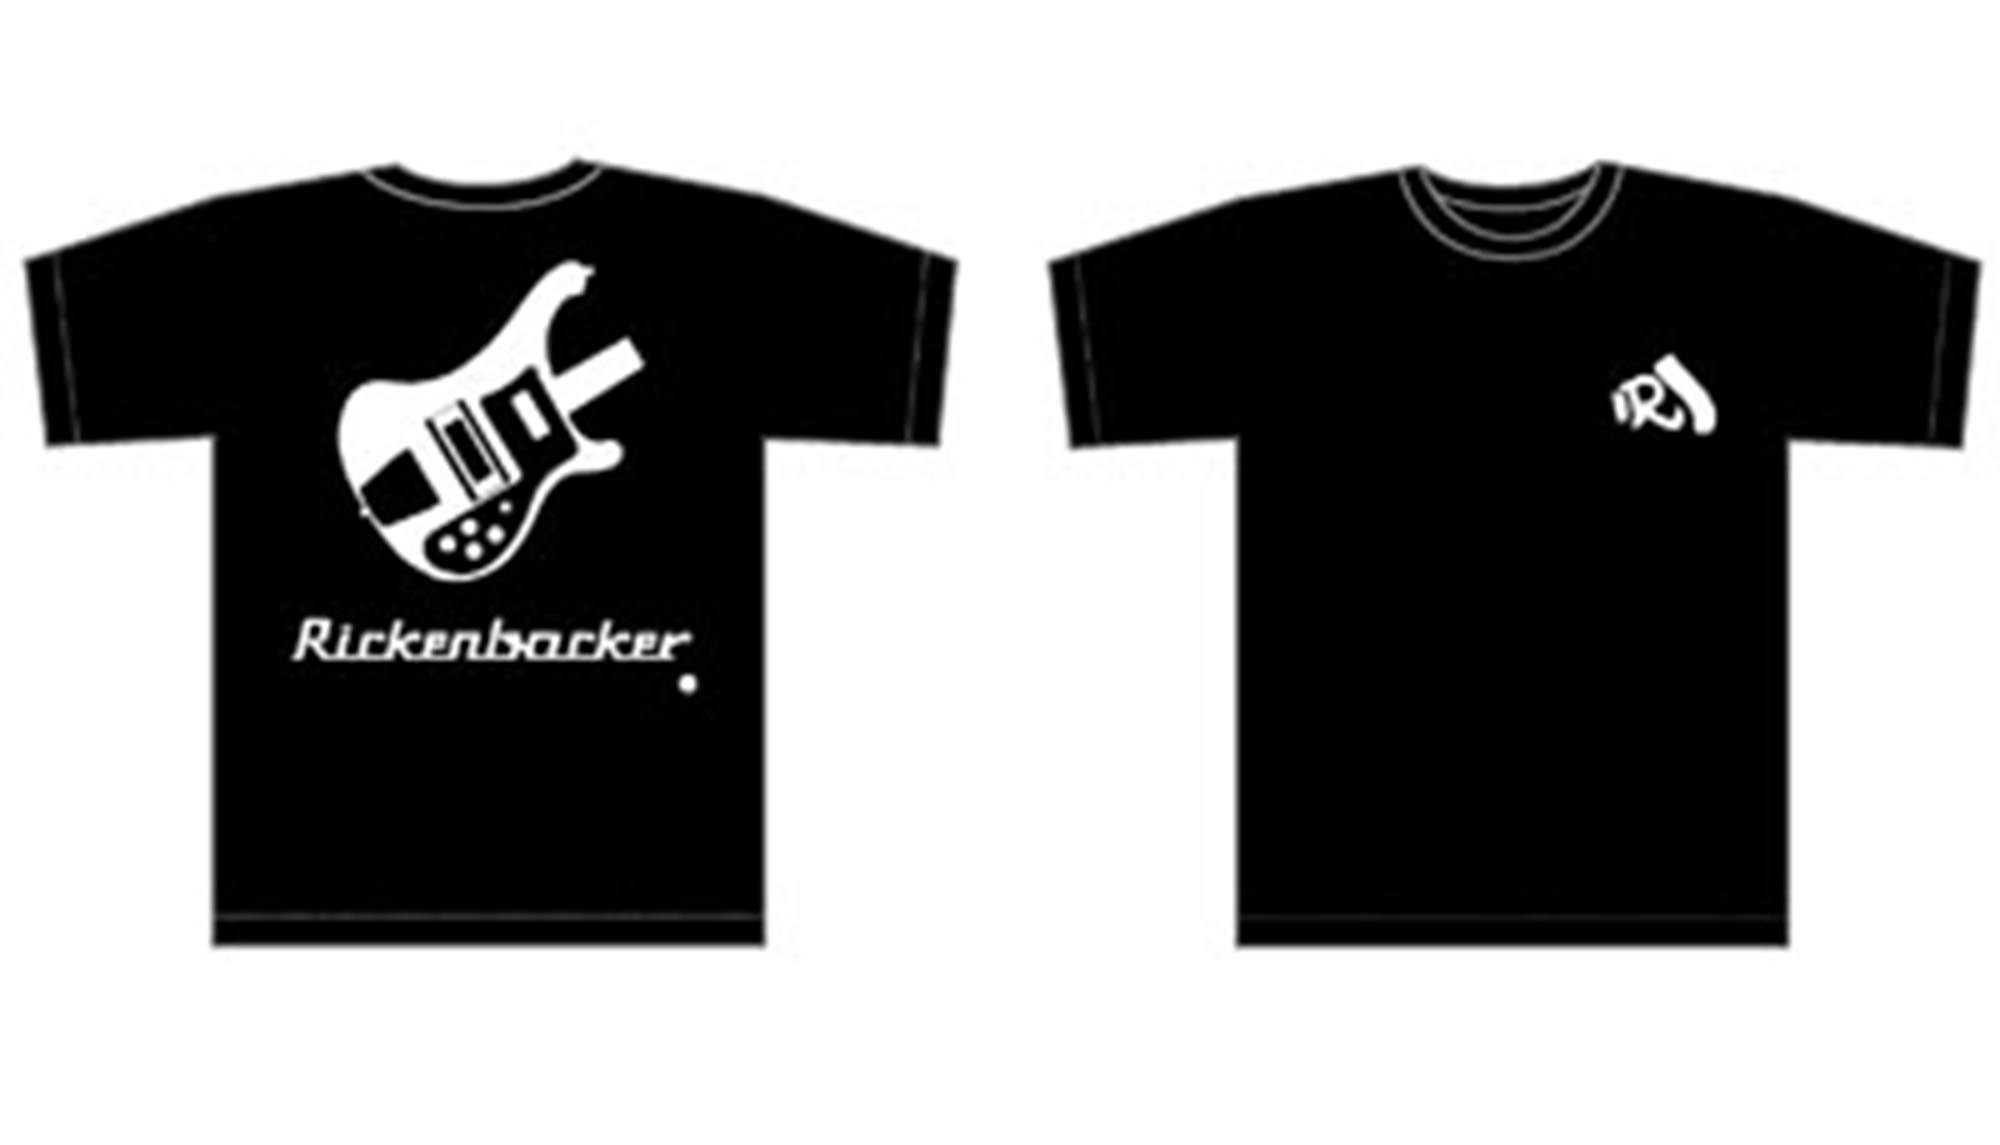 Rickenbacker Bass T-Shirt - Extra Large